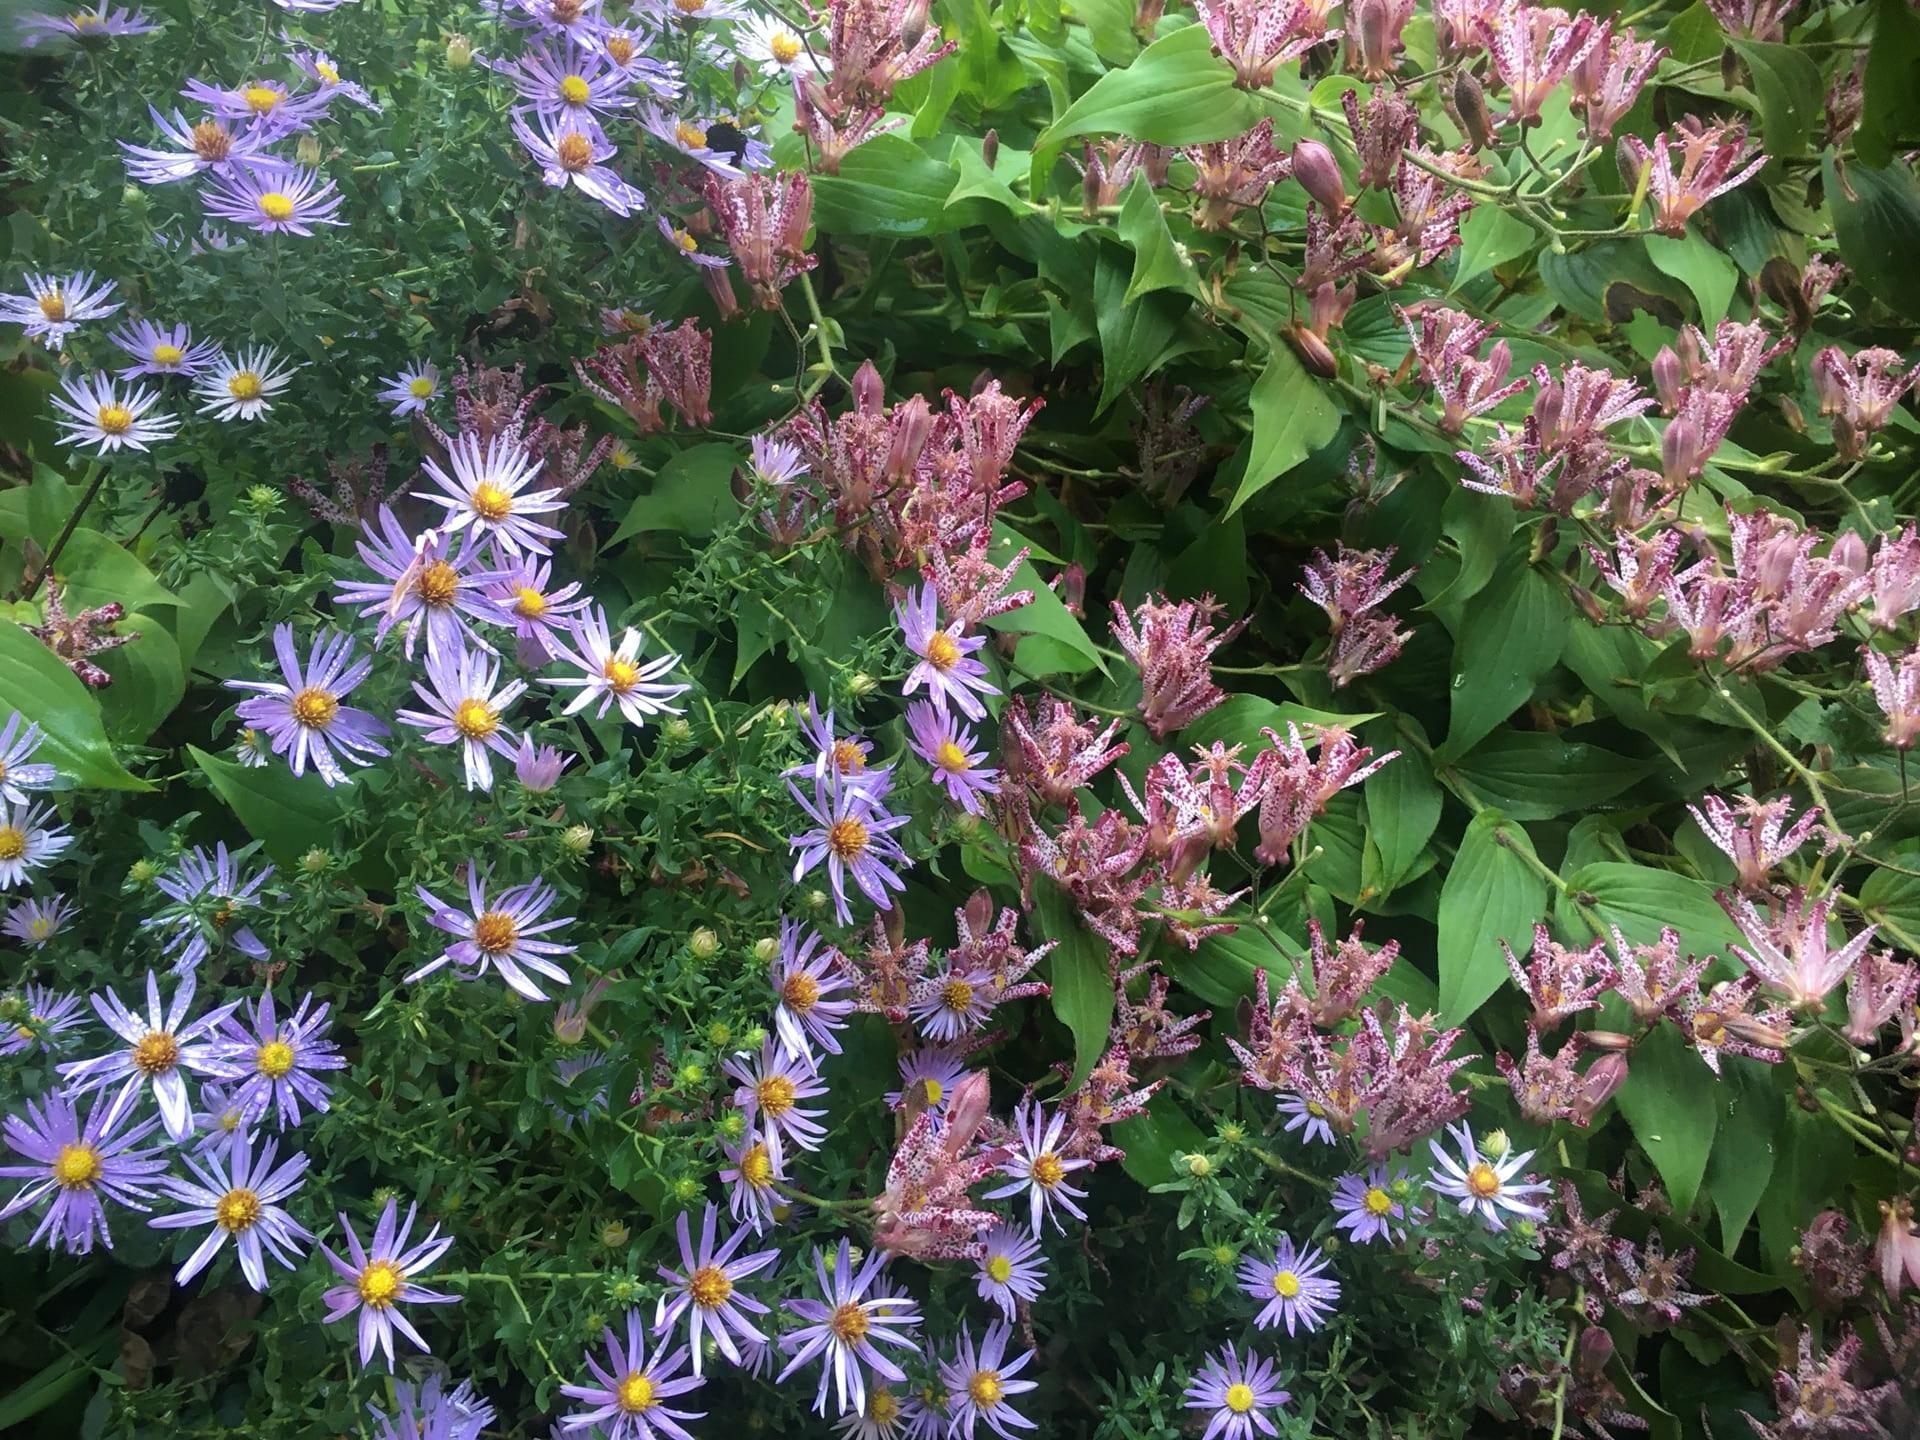 Late season blooms of Tricyris formosana mingle with those of Symphyotrichum novae-angliae.